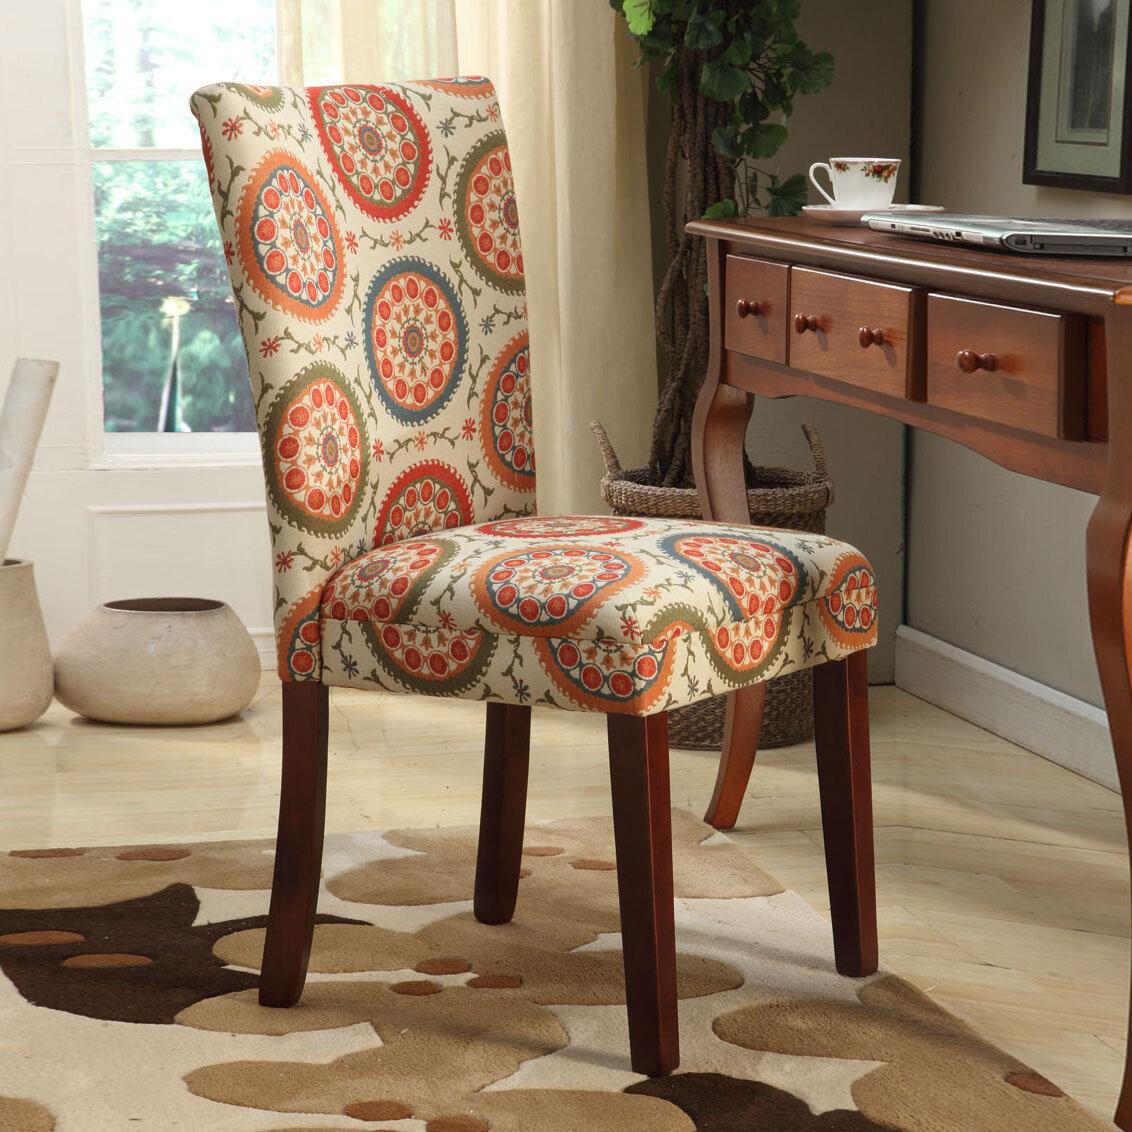 Lattice Back Side Chair | Wayfair Regarding Carbon Loft Ariel Rocking Chairs In Espresso Pu And Walnut (View 7 of 20)